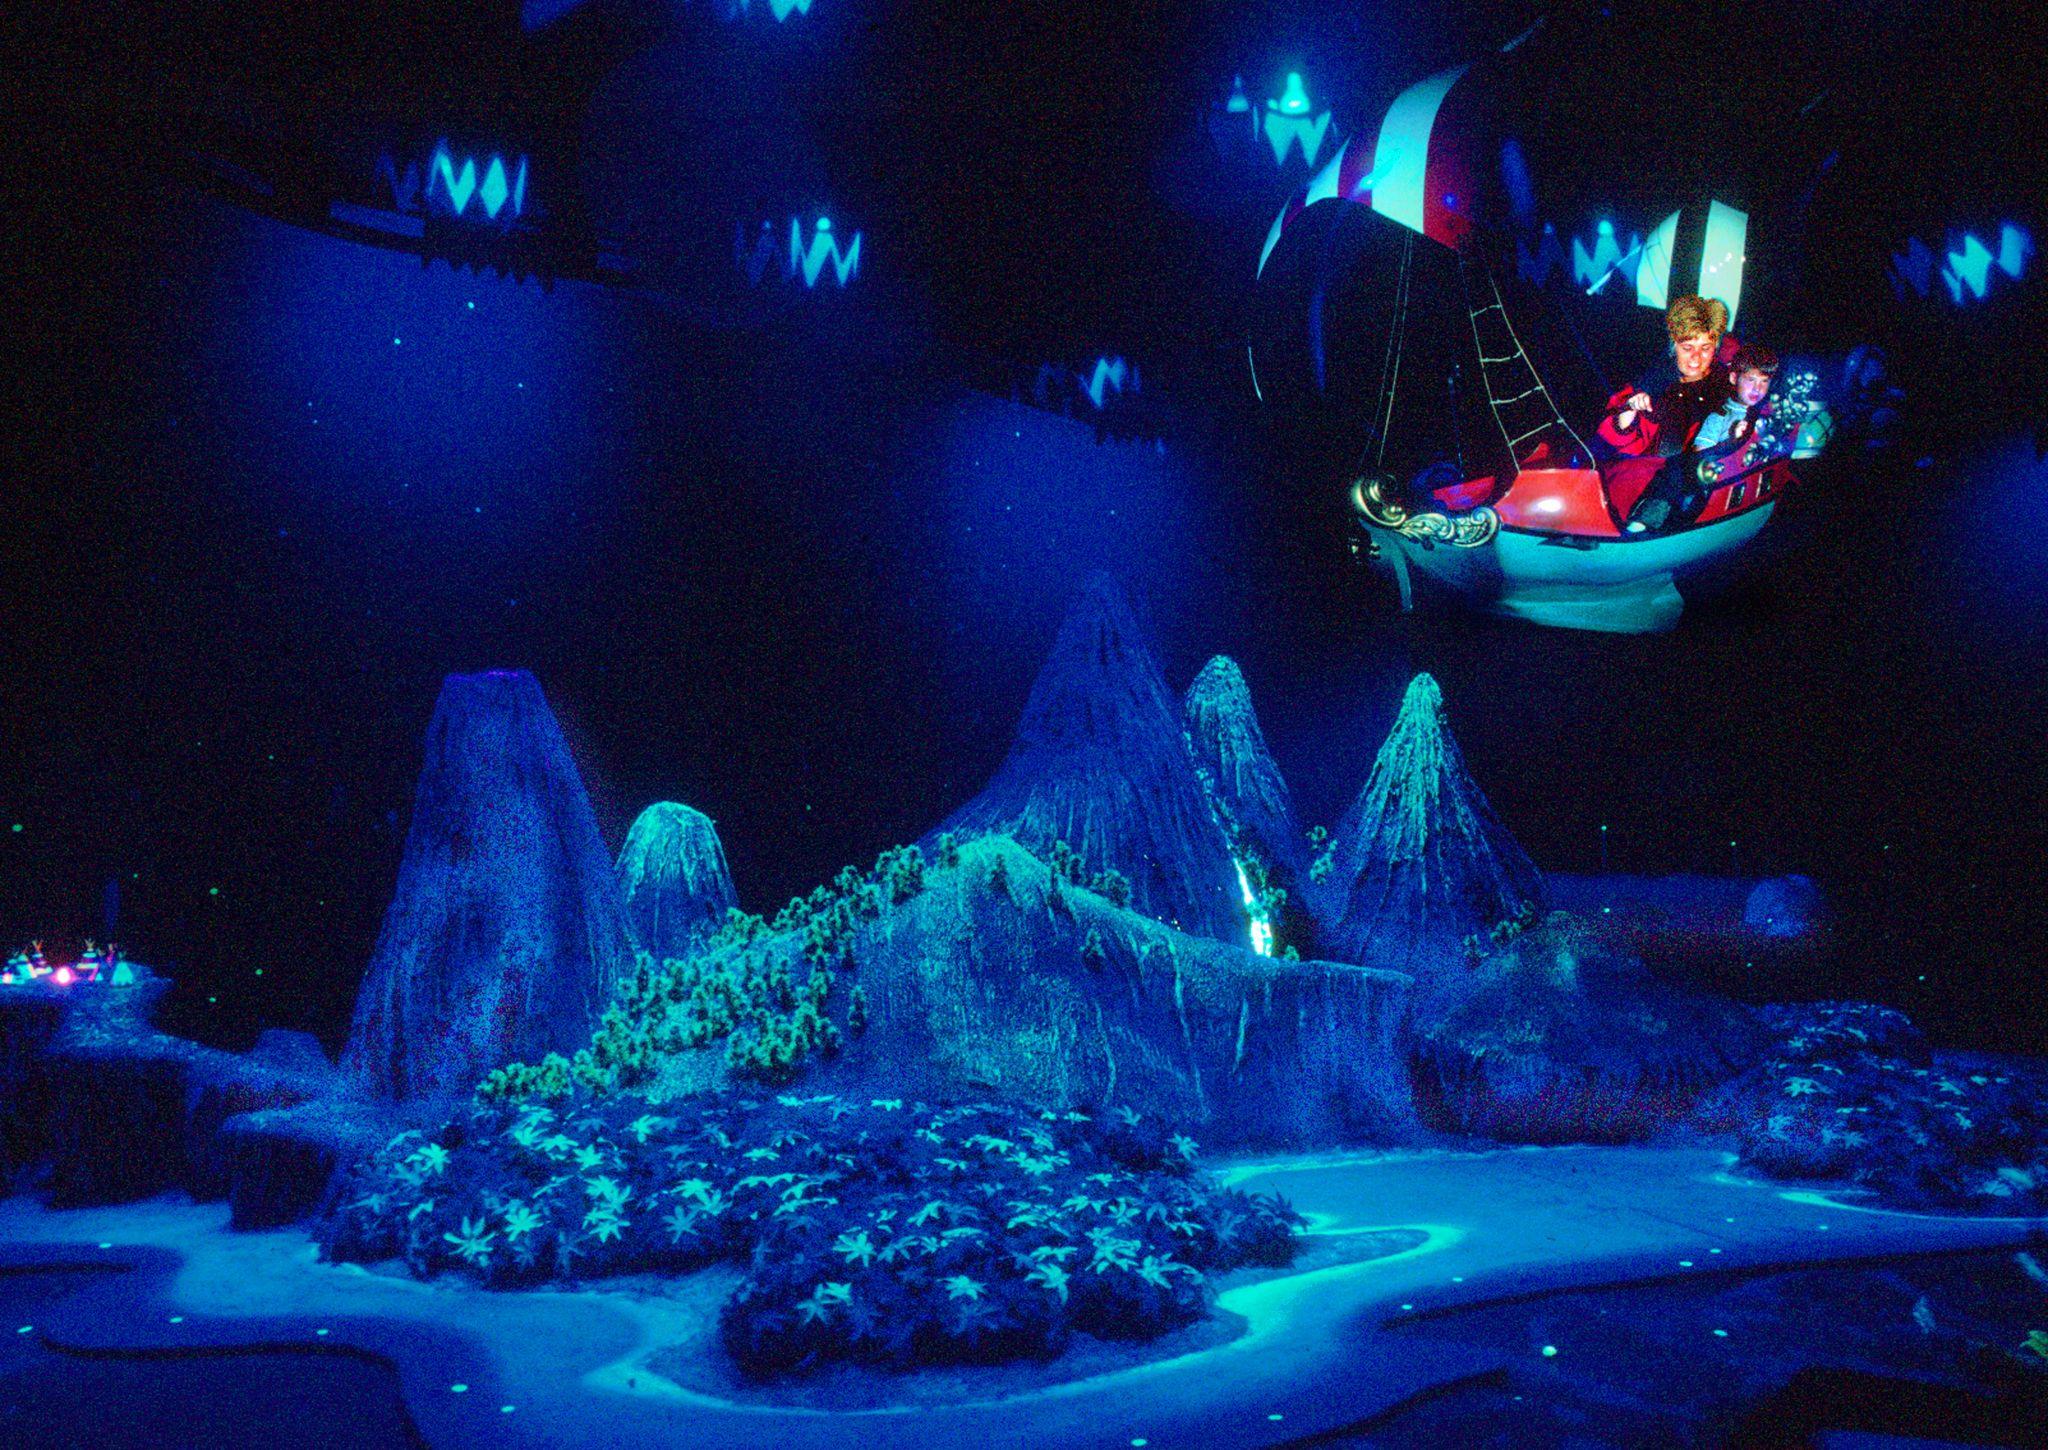 Will Peter Pan's Flight be the next Disneyland ride to go?